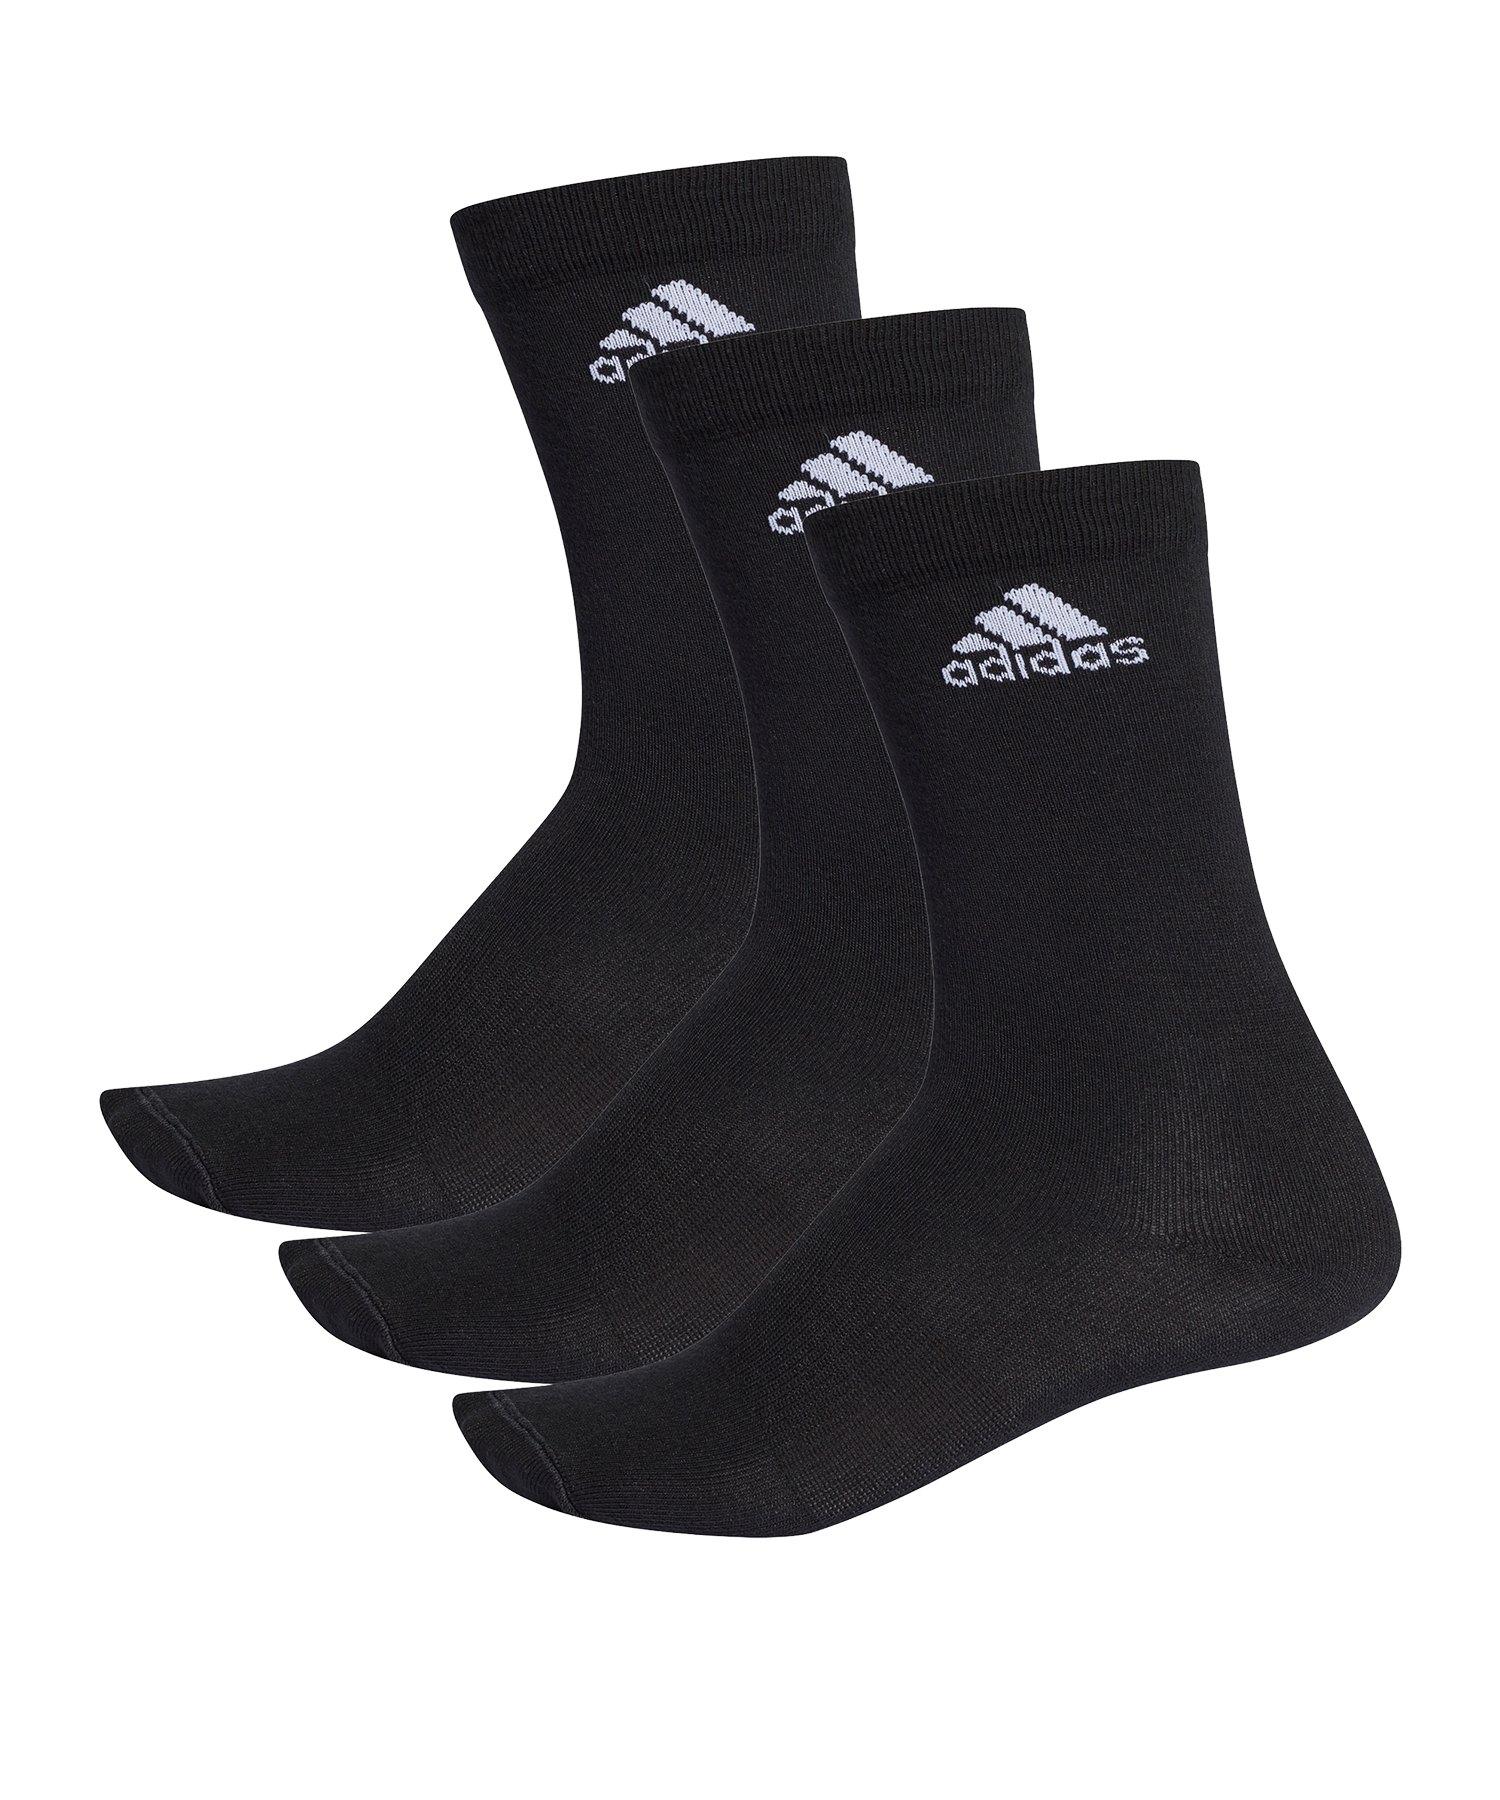 adidas Crew Socks Socken 3er Pack Schwarz - schwarz